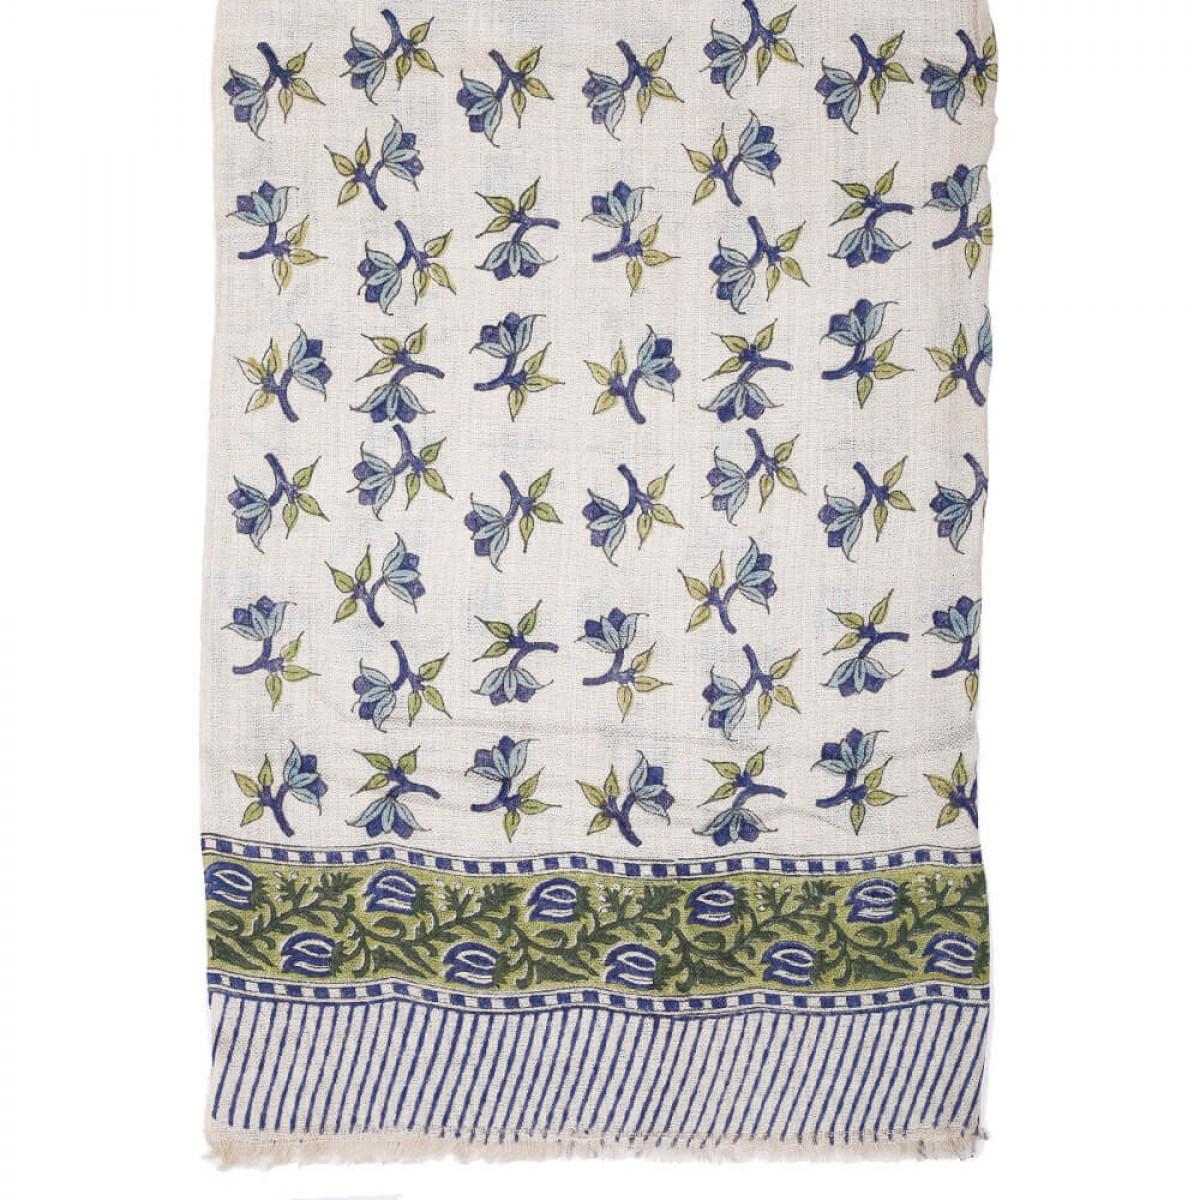 Block Printed Woolen Shawl - Aegean